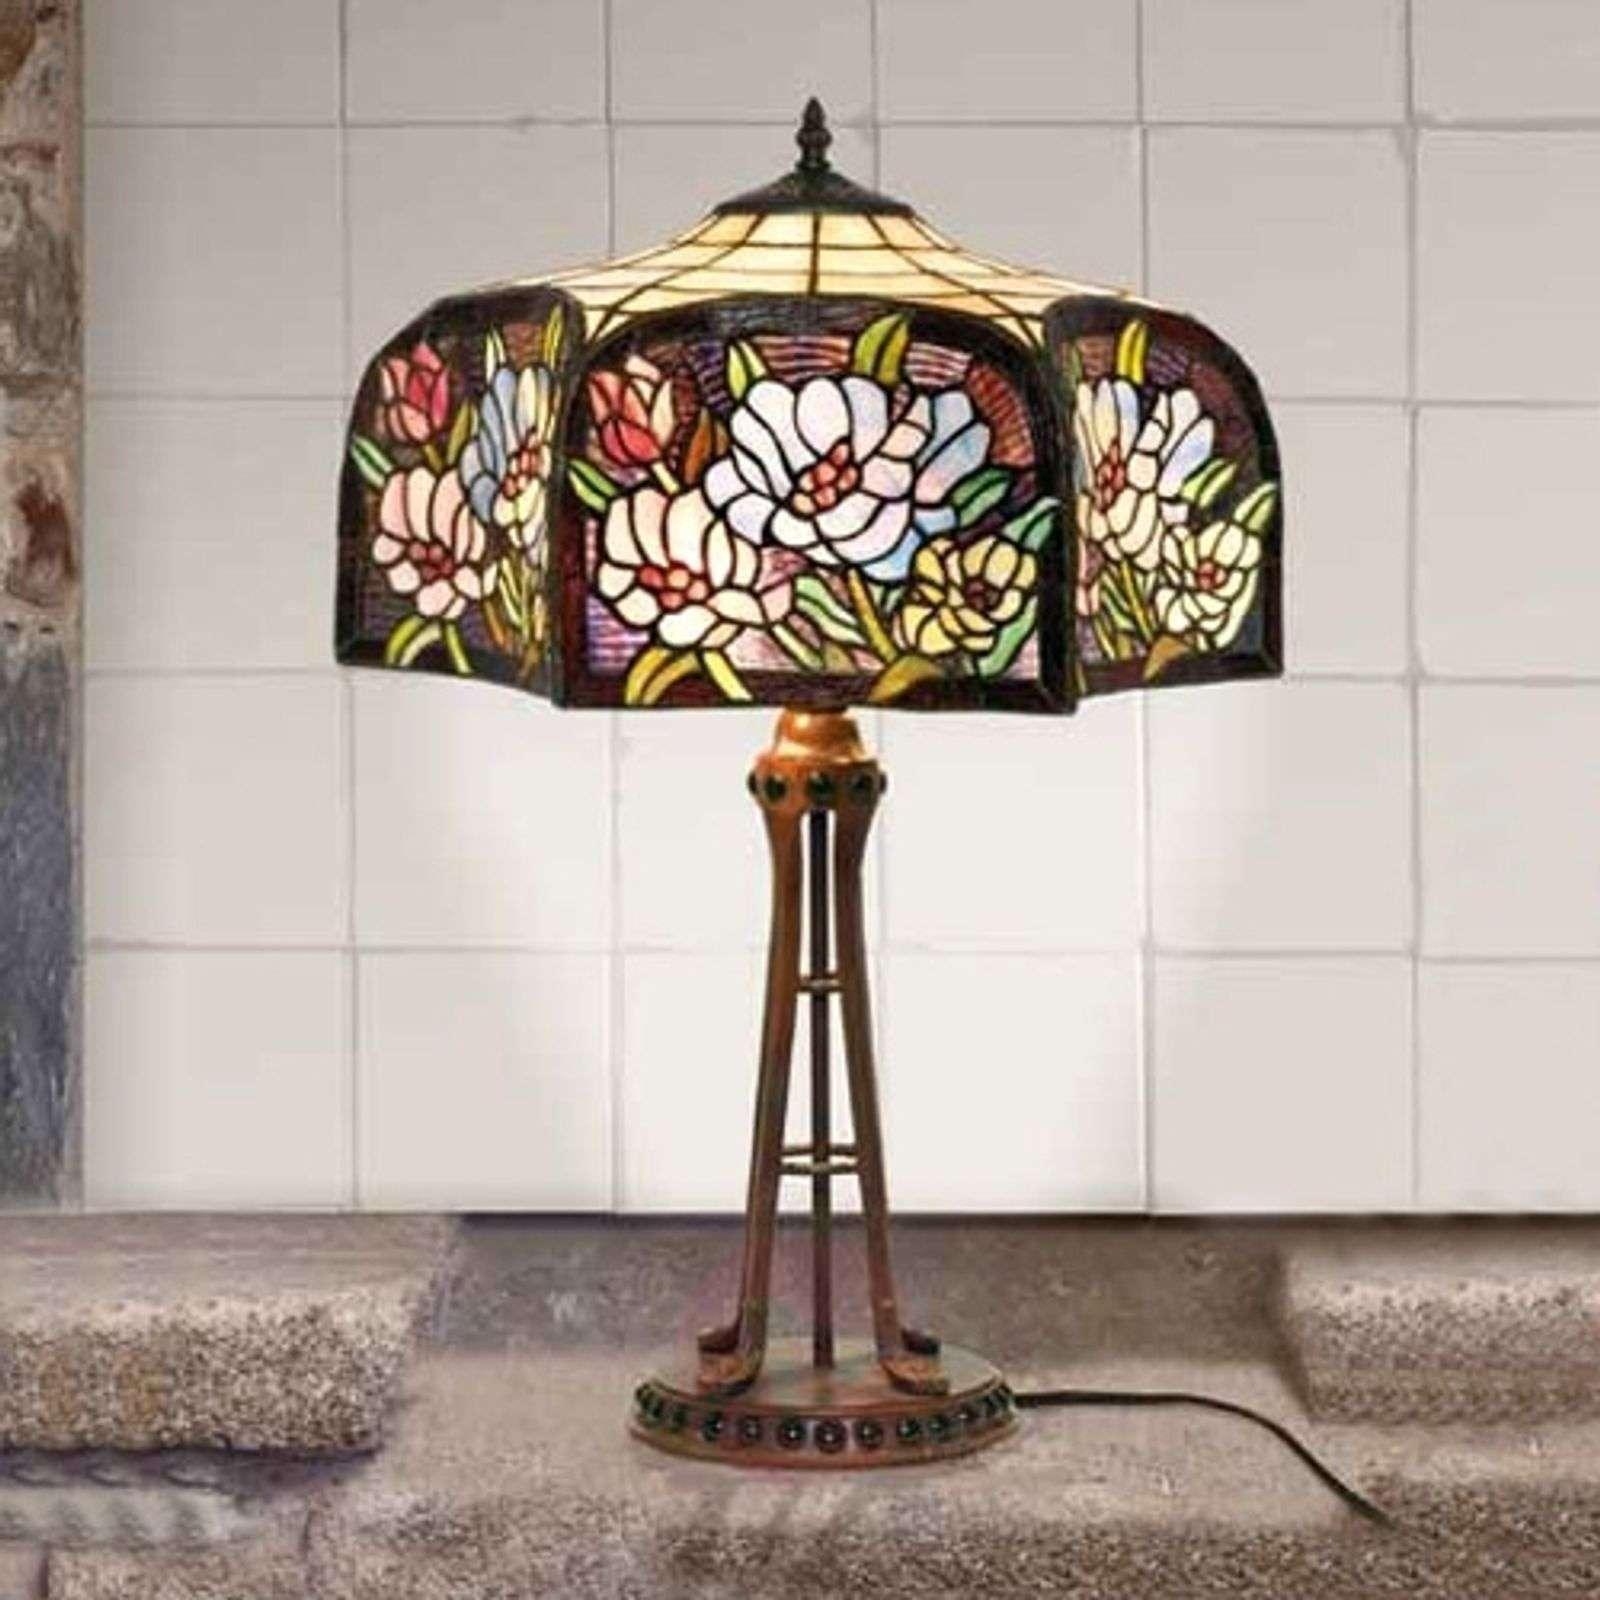 Tiffany-style table lamp Prim-1032241-01